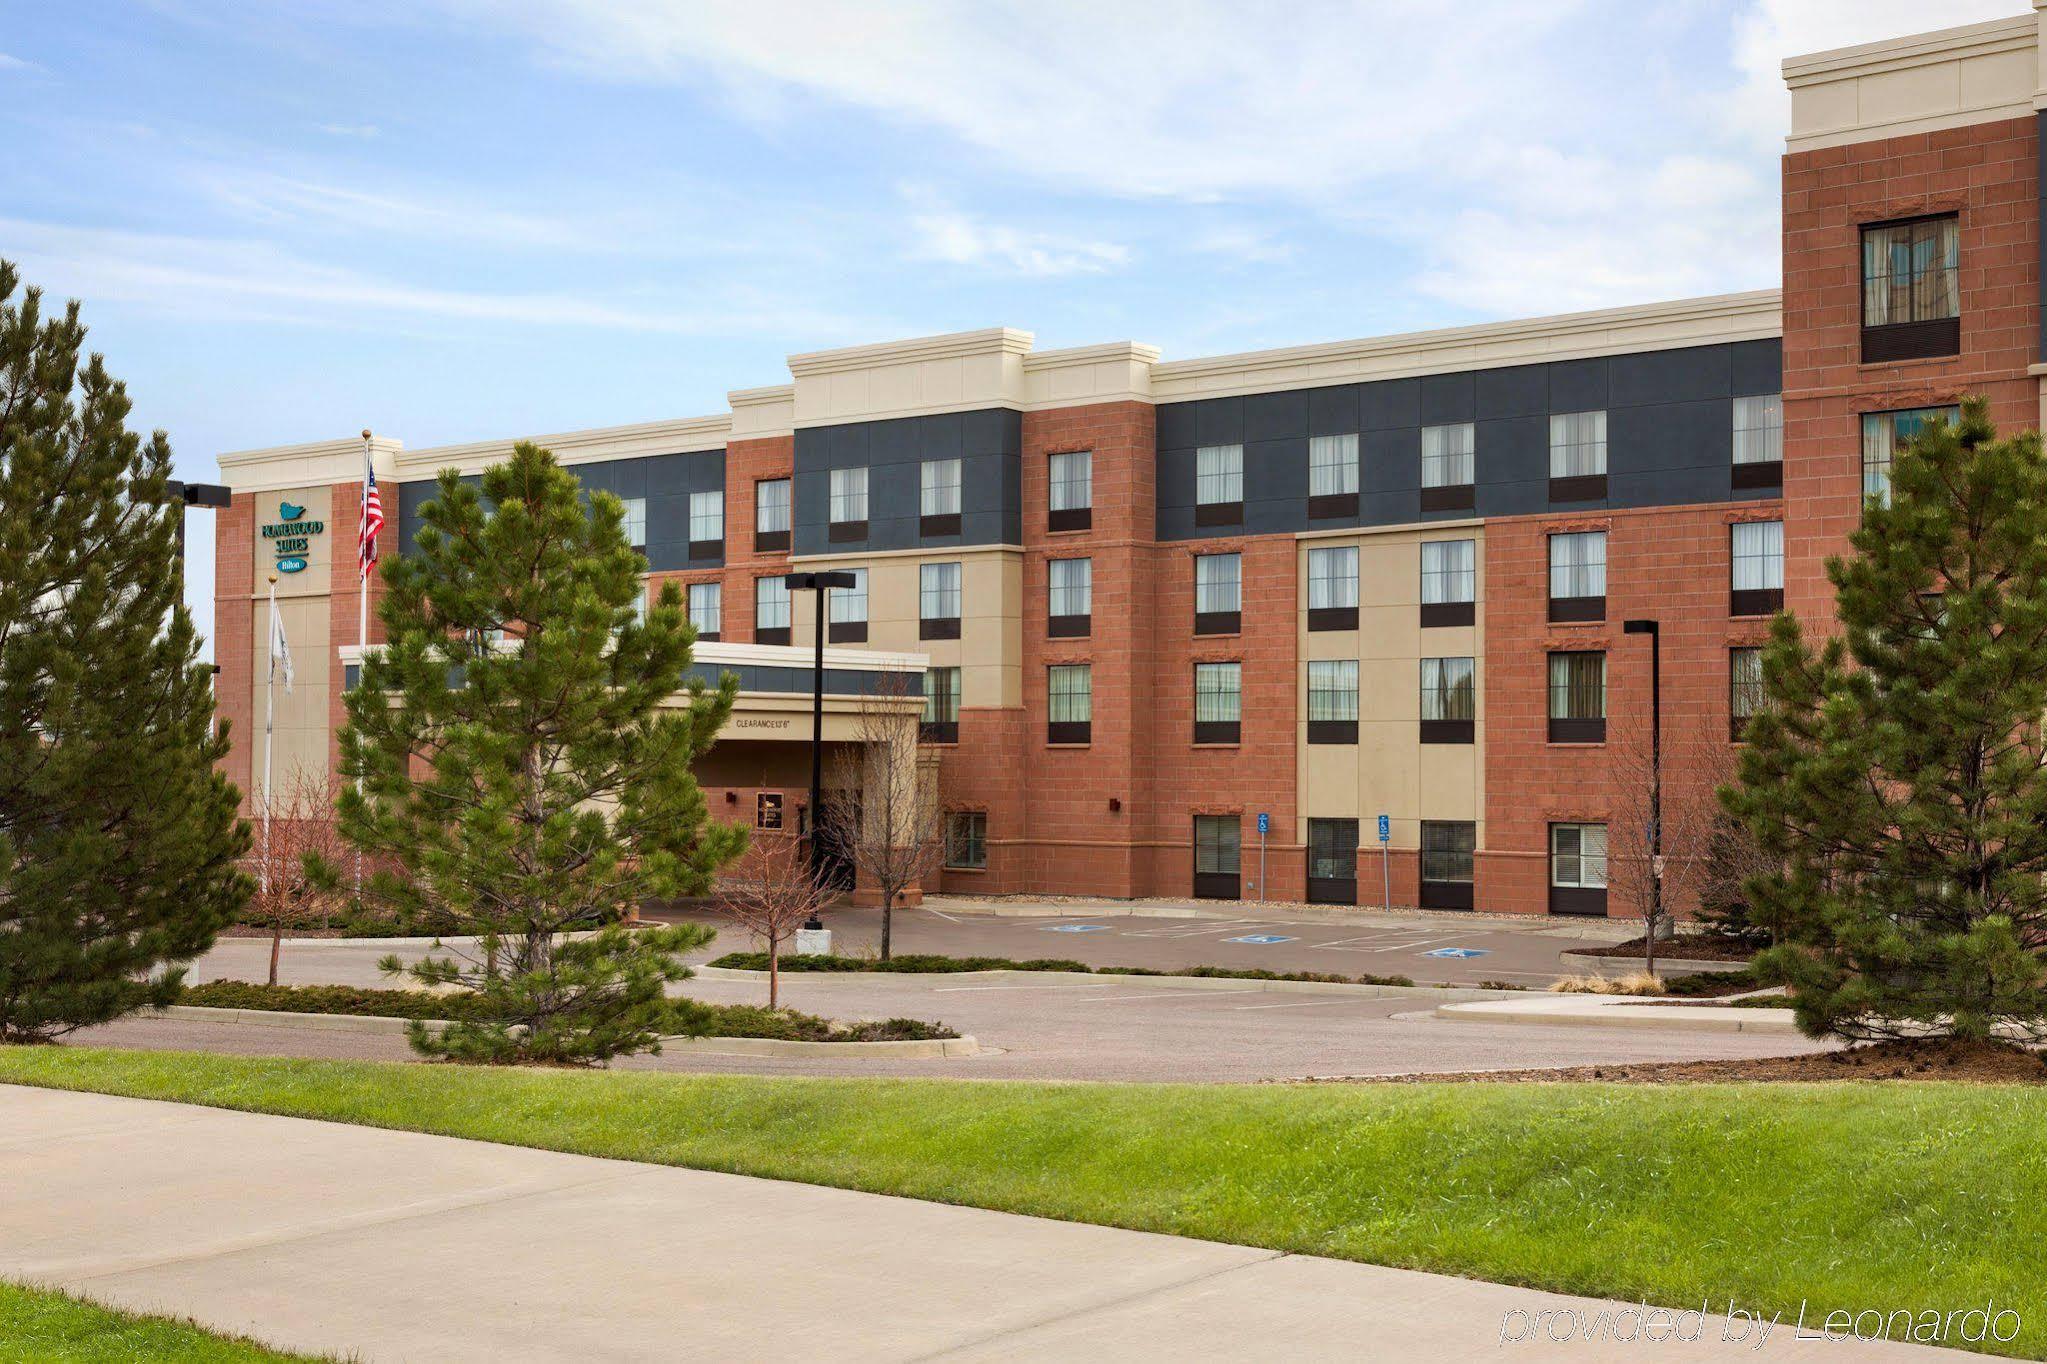 Homewood Suites by Hilton Denver Tech Center on